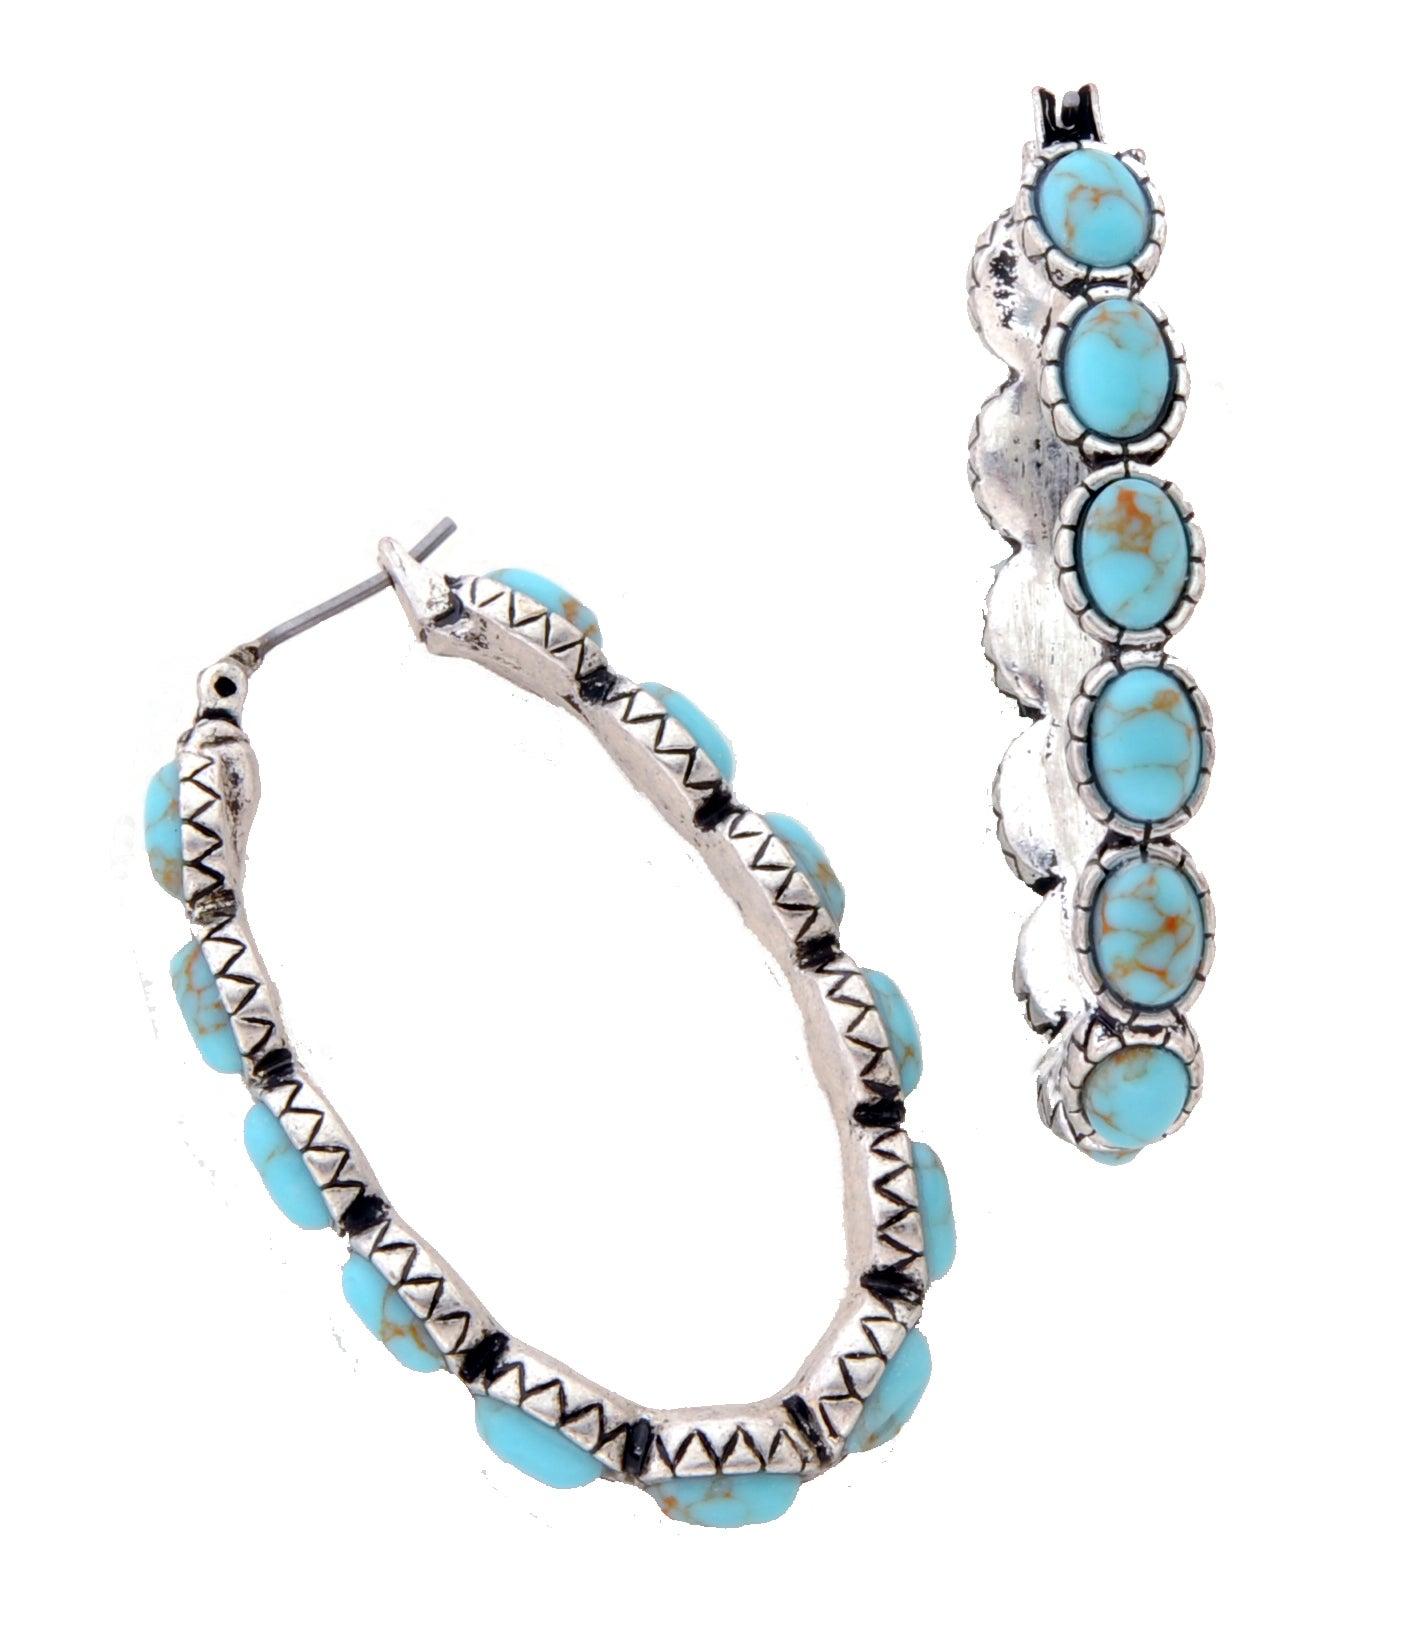 Turquoise Oblong Hoop Earrings